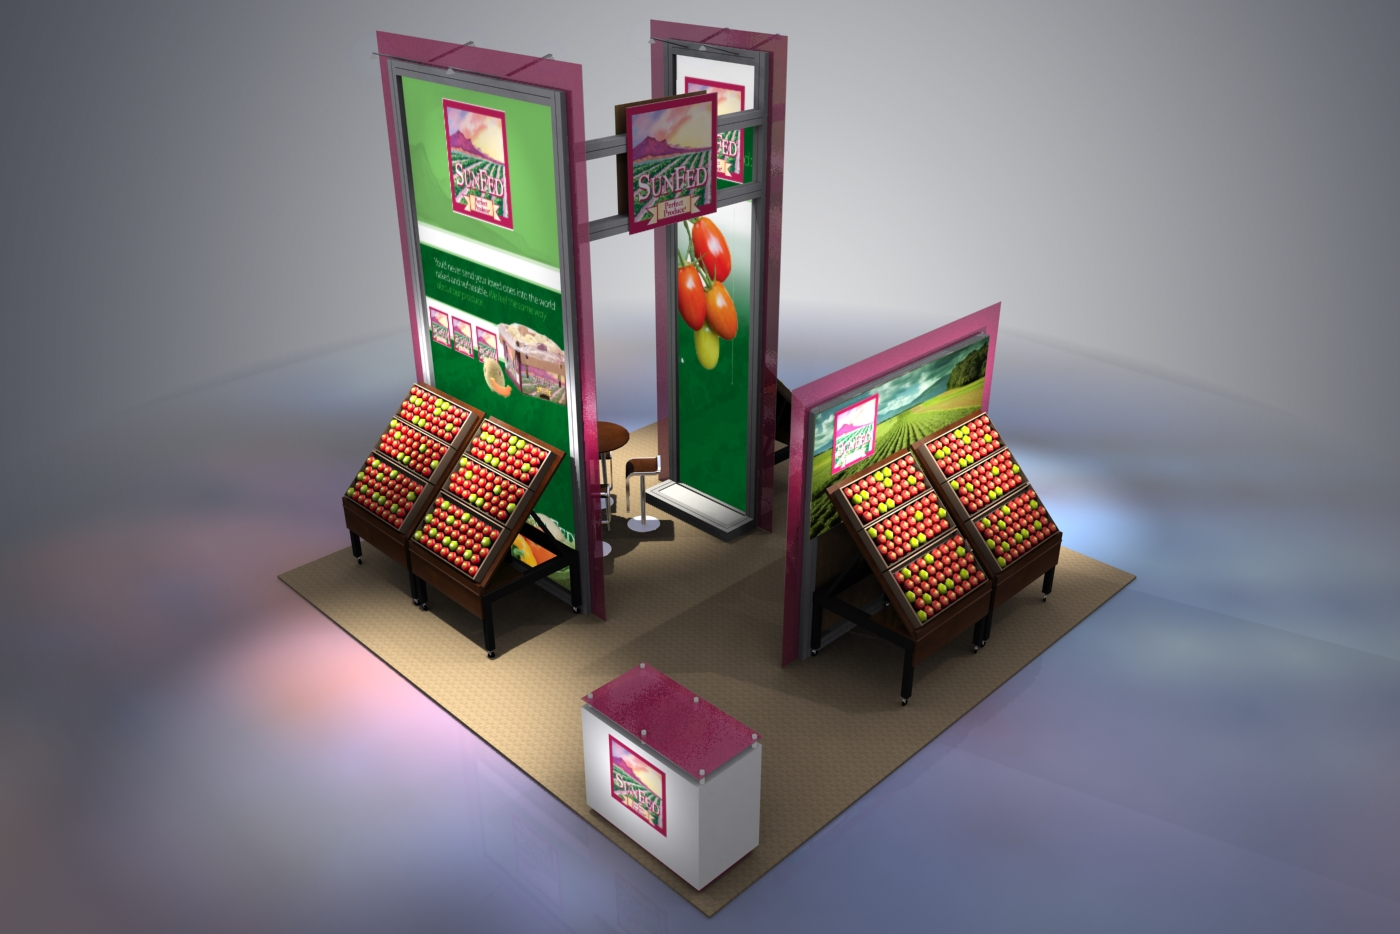 creatve trade show display ideas